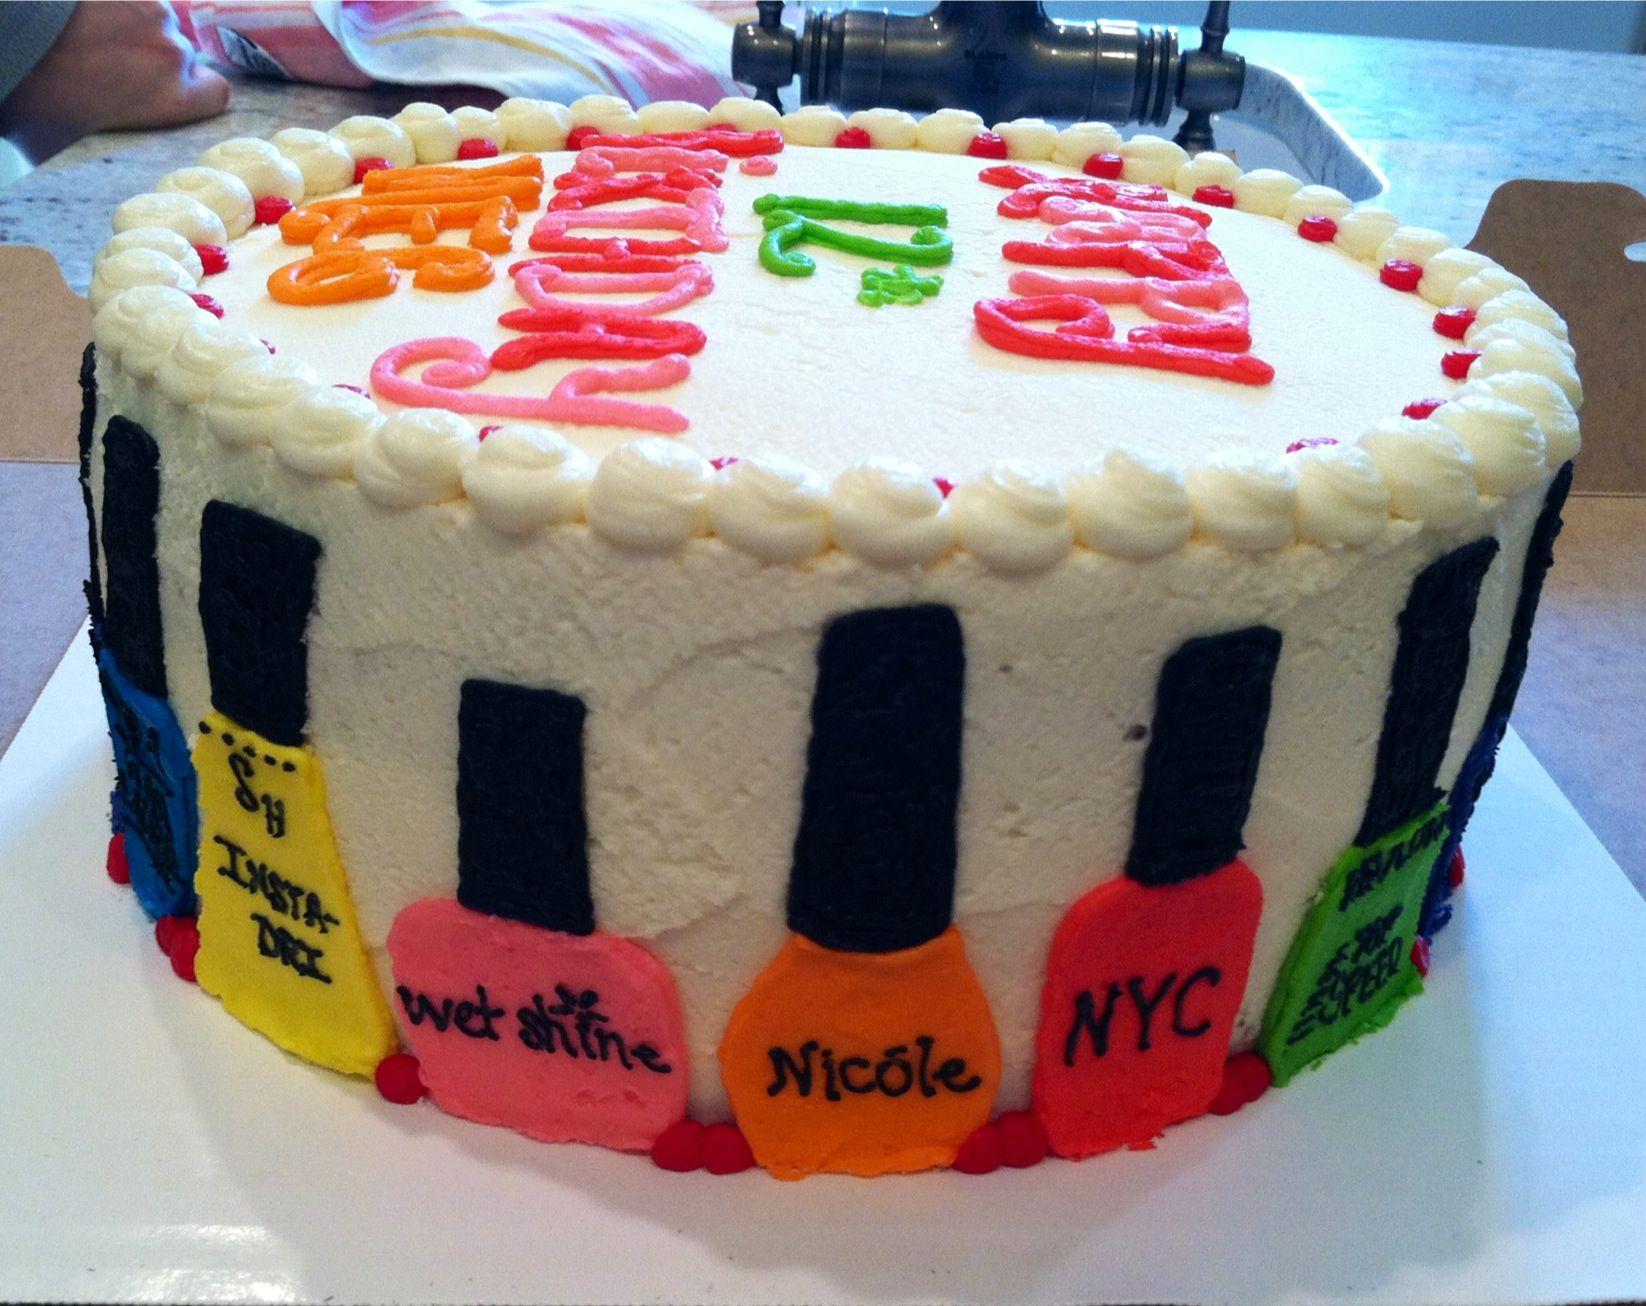 Nail polish cake   Cakes   Pinterest   Pedicures, Cake and Birthdays